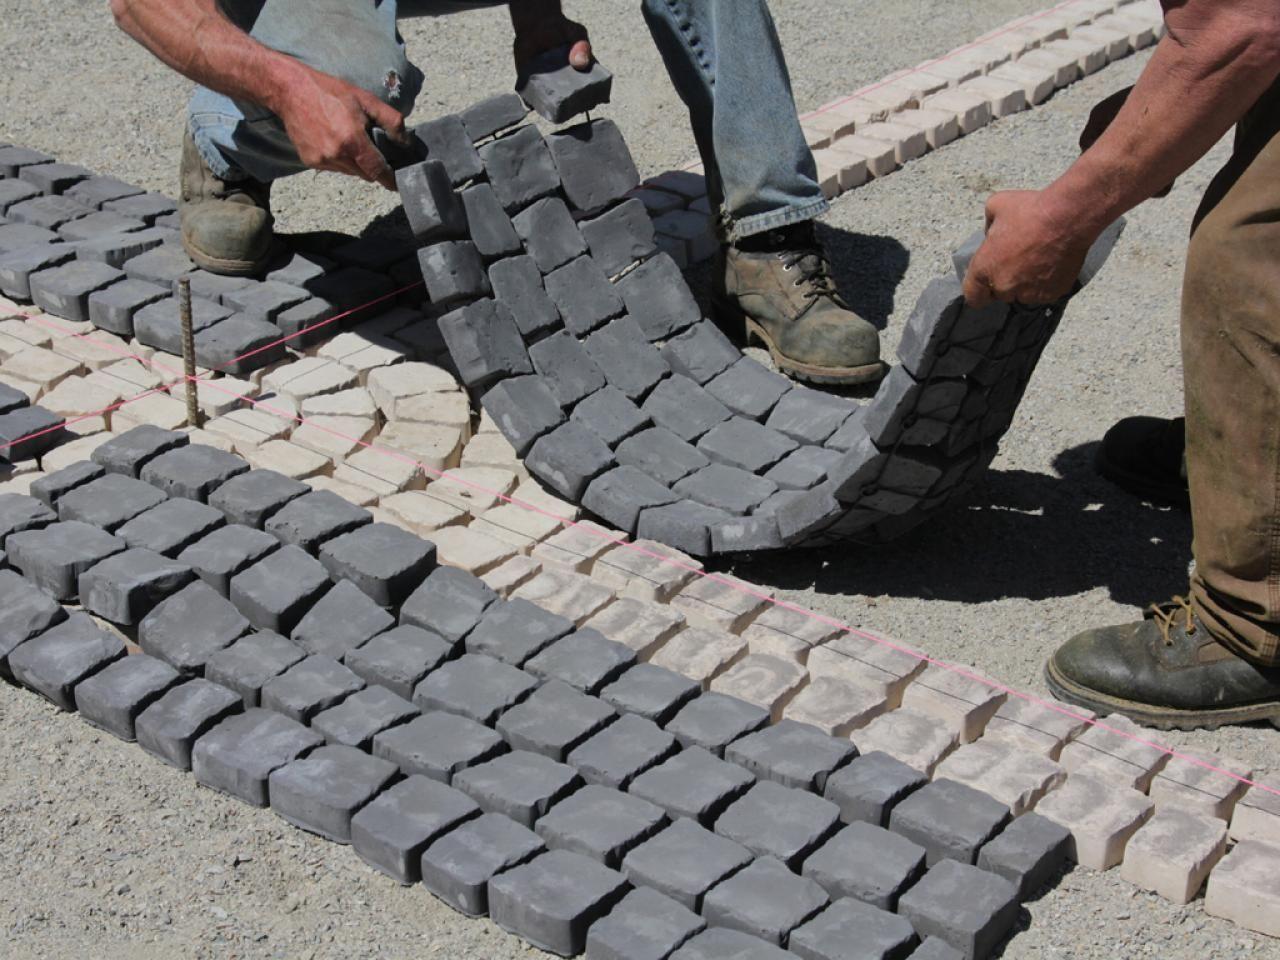 Pin By Sonia Mcclain On Landscape Ideas Cobblestone Patio Concrete Molds Patio Patio Stones